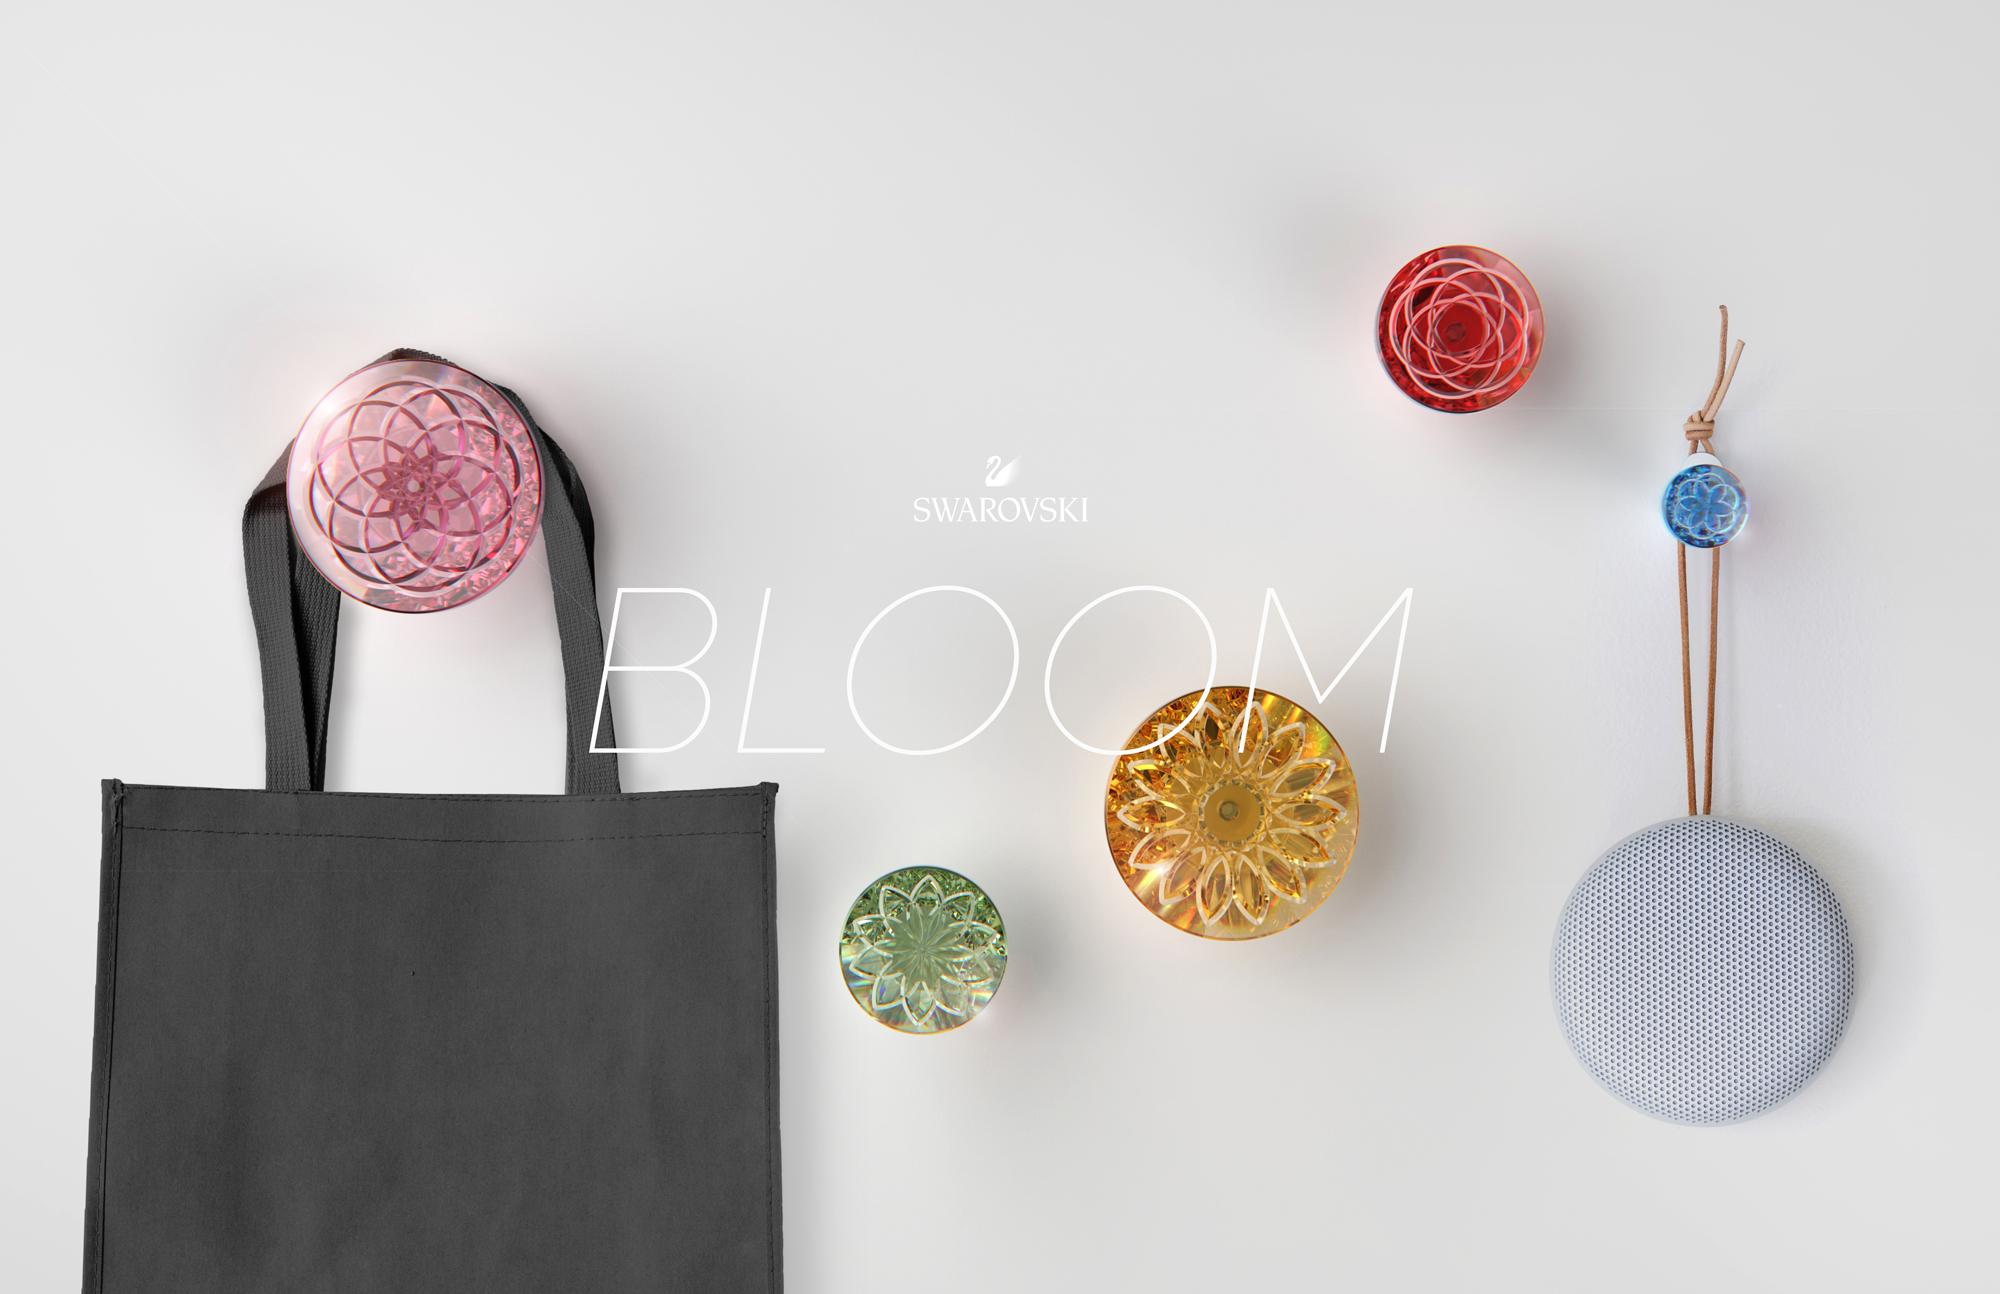 s_bloom_title.jpg